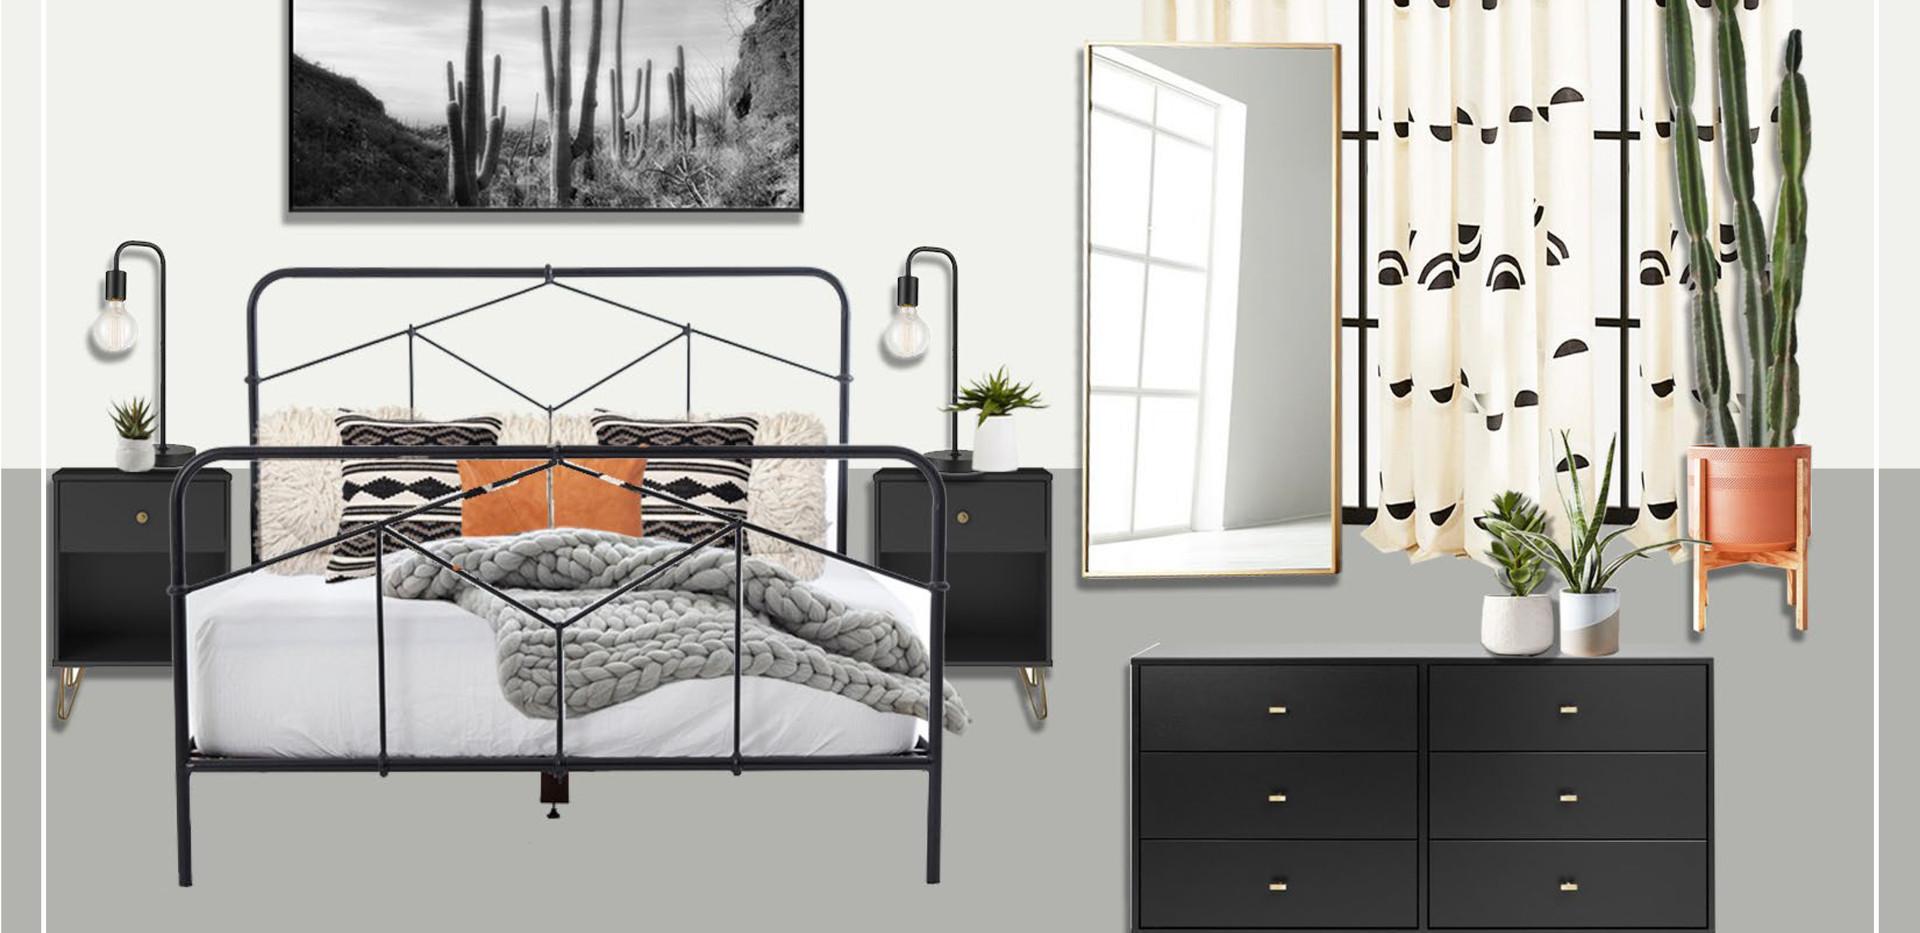 Bedroom B | Original Concept Collage